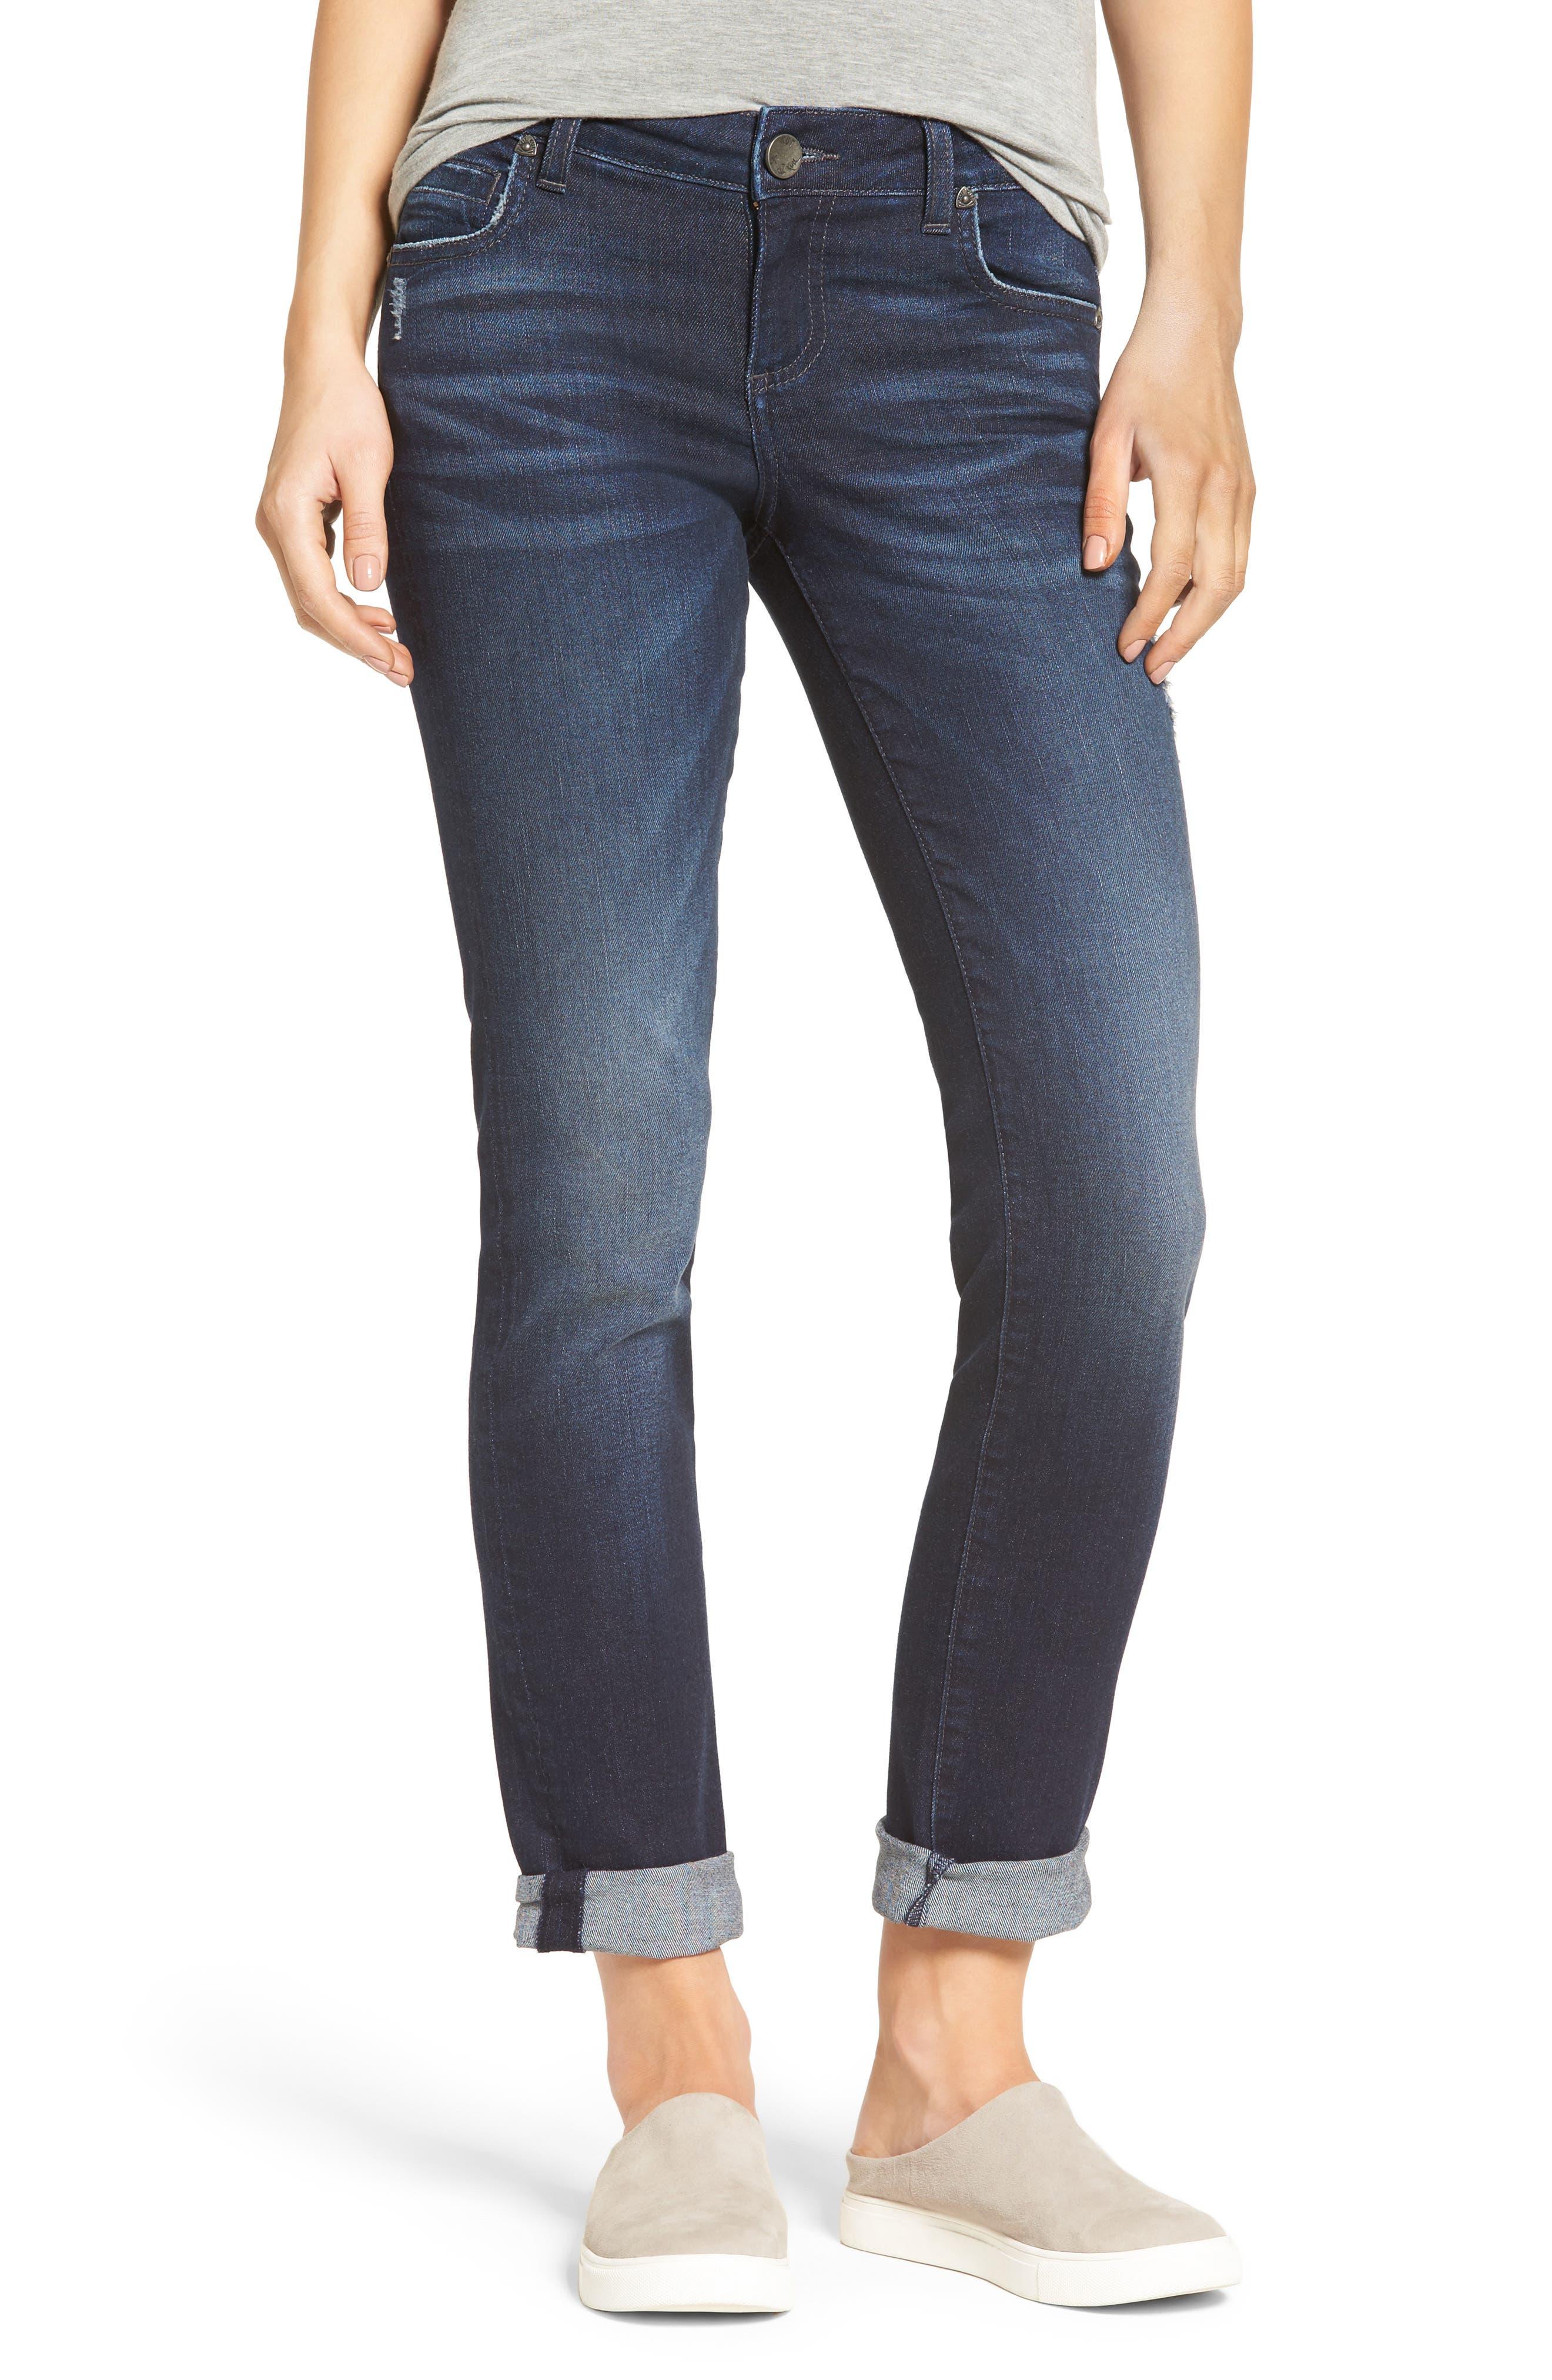 Alternate Image 1 Selected - KUT from the Kloth Catherine Boyfriend Jeans (Regular & Petite) (Vogue)